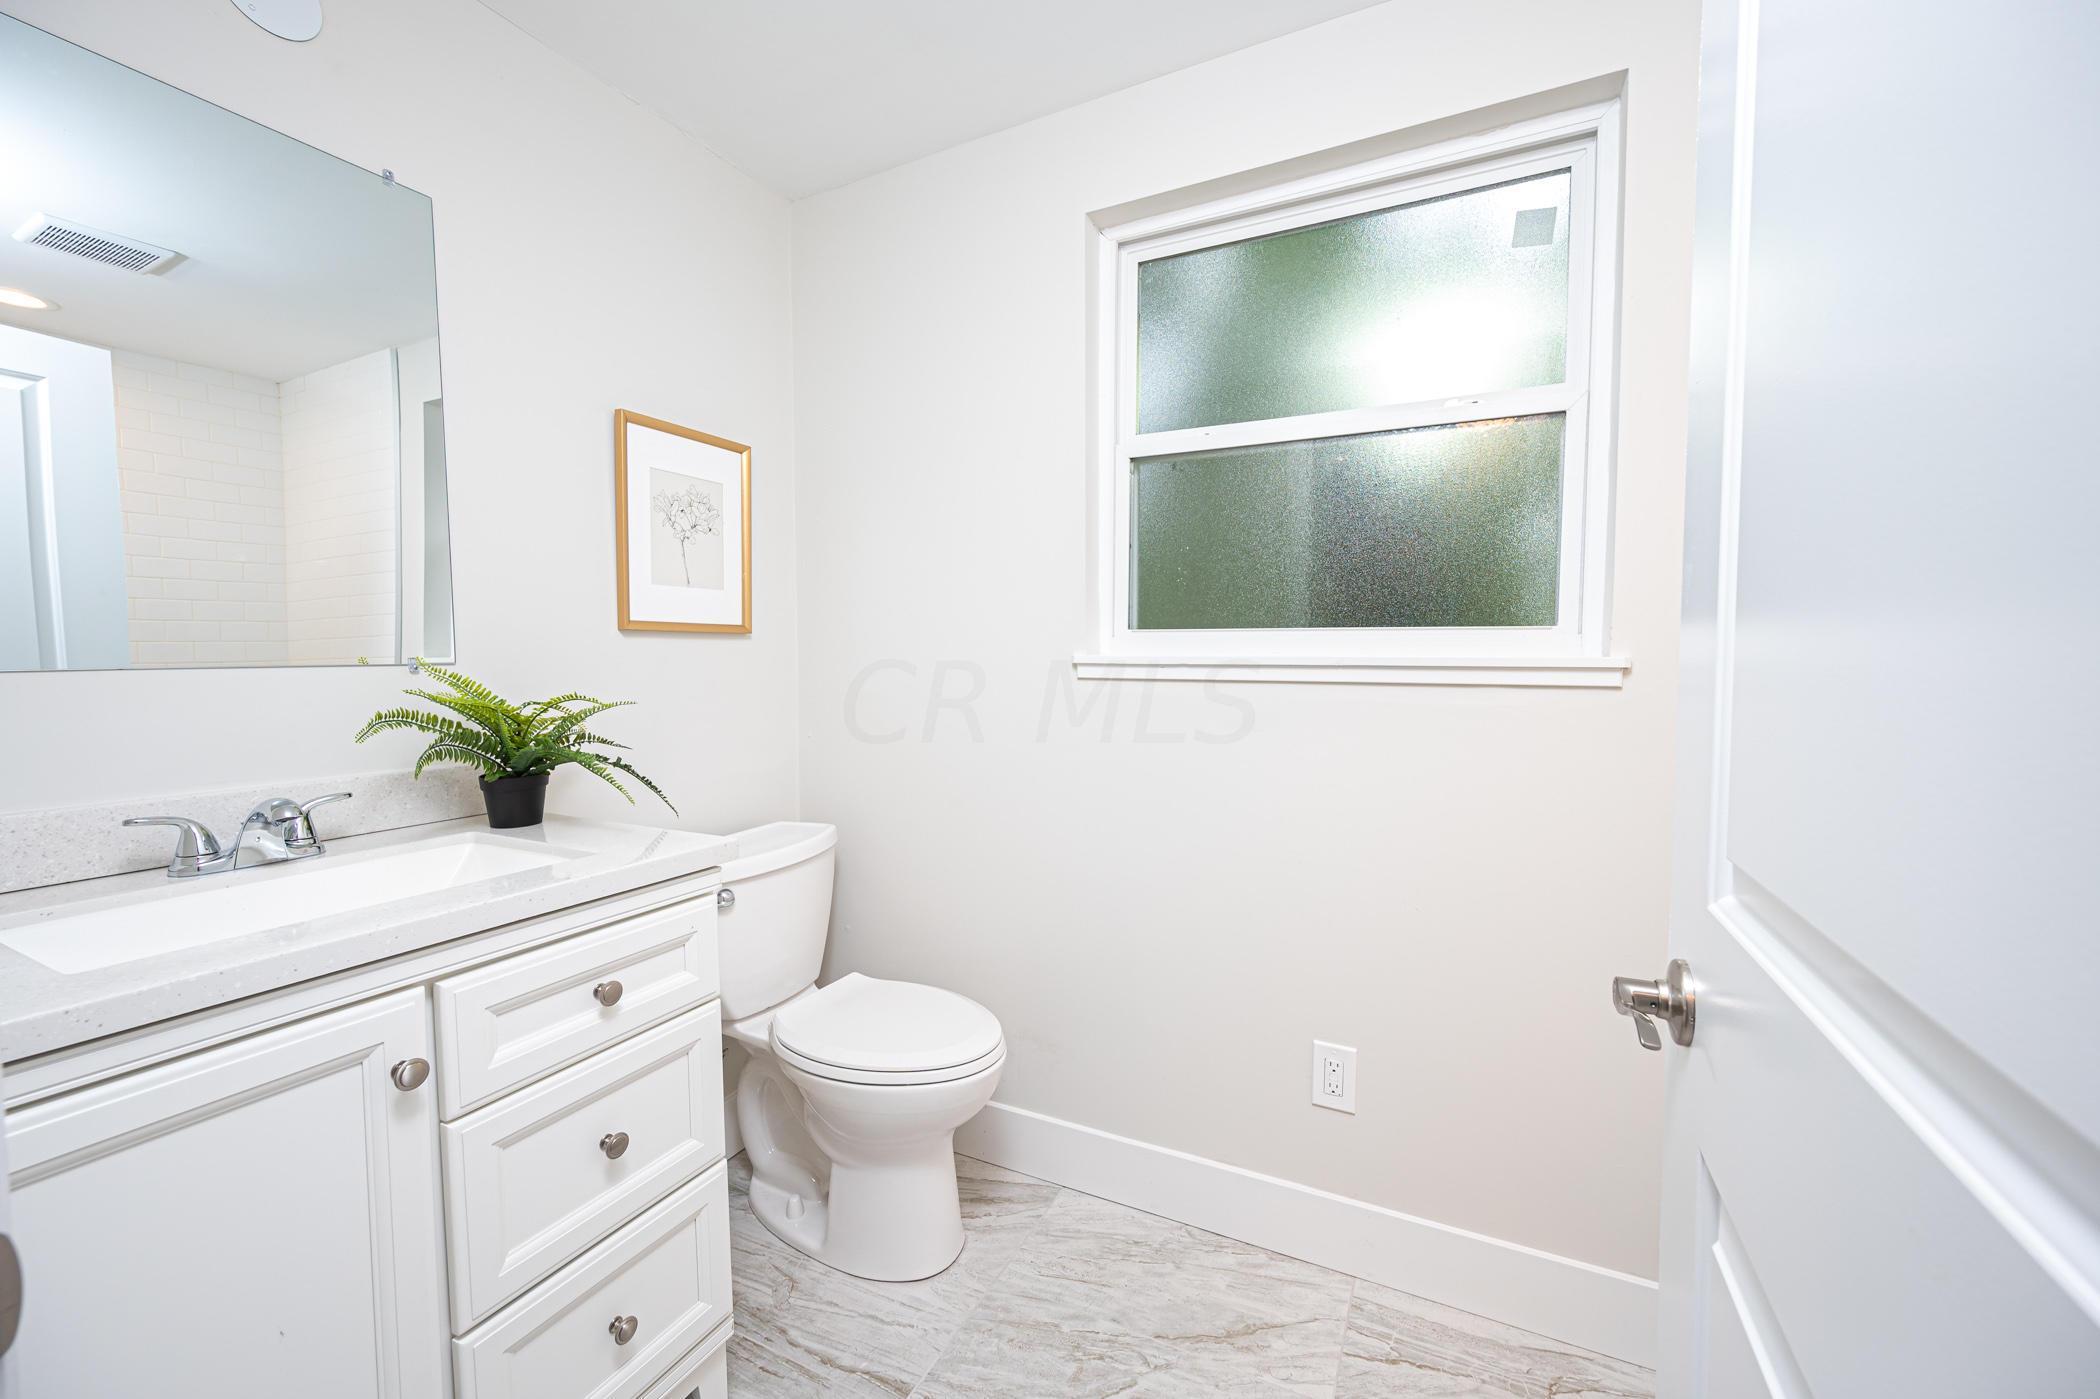 4186 Windermere Road, Upper Arlington, Ohio 43220, 3 Bedrooms Bedrooms, ,3 BathroomsBathrooms,Residential,For Sale,Windermere,220030519